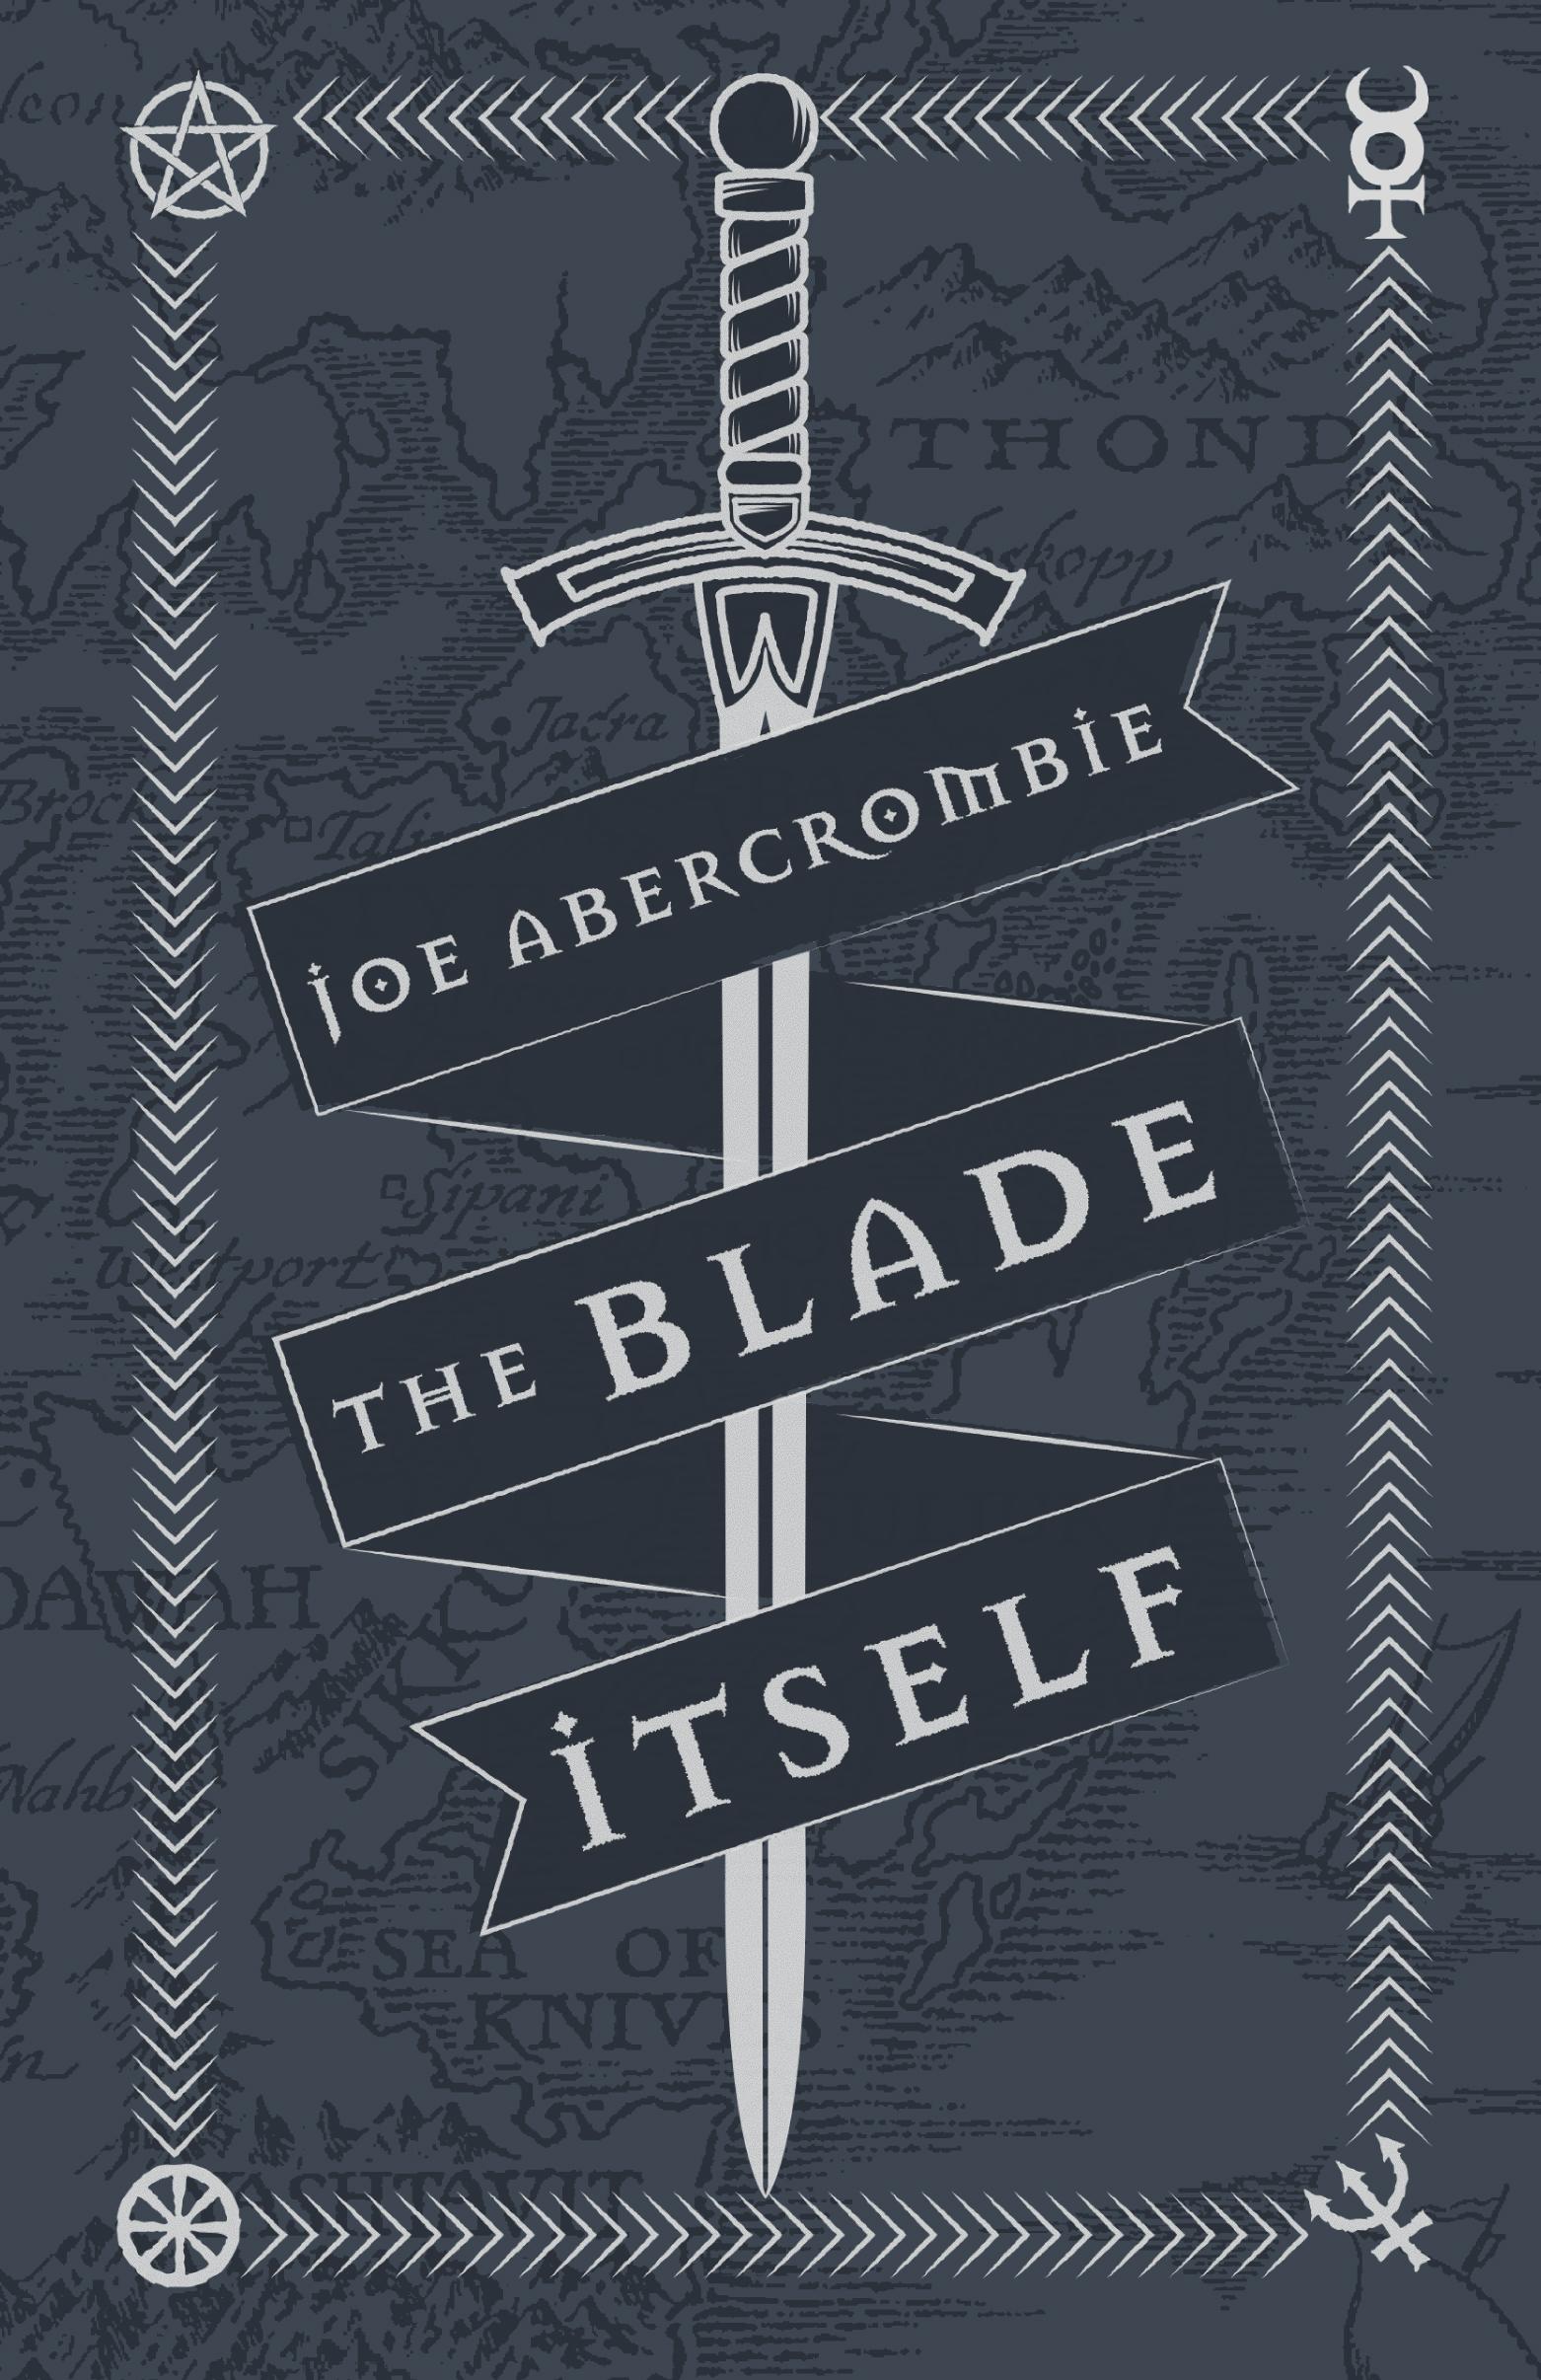 Blade-Itself